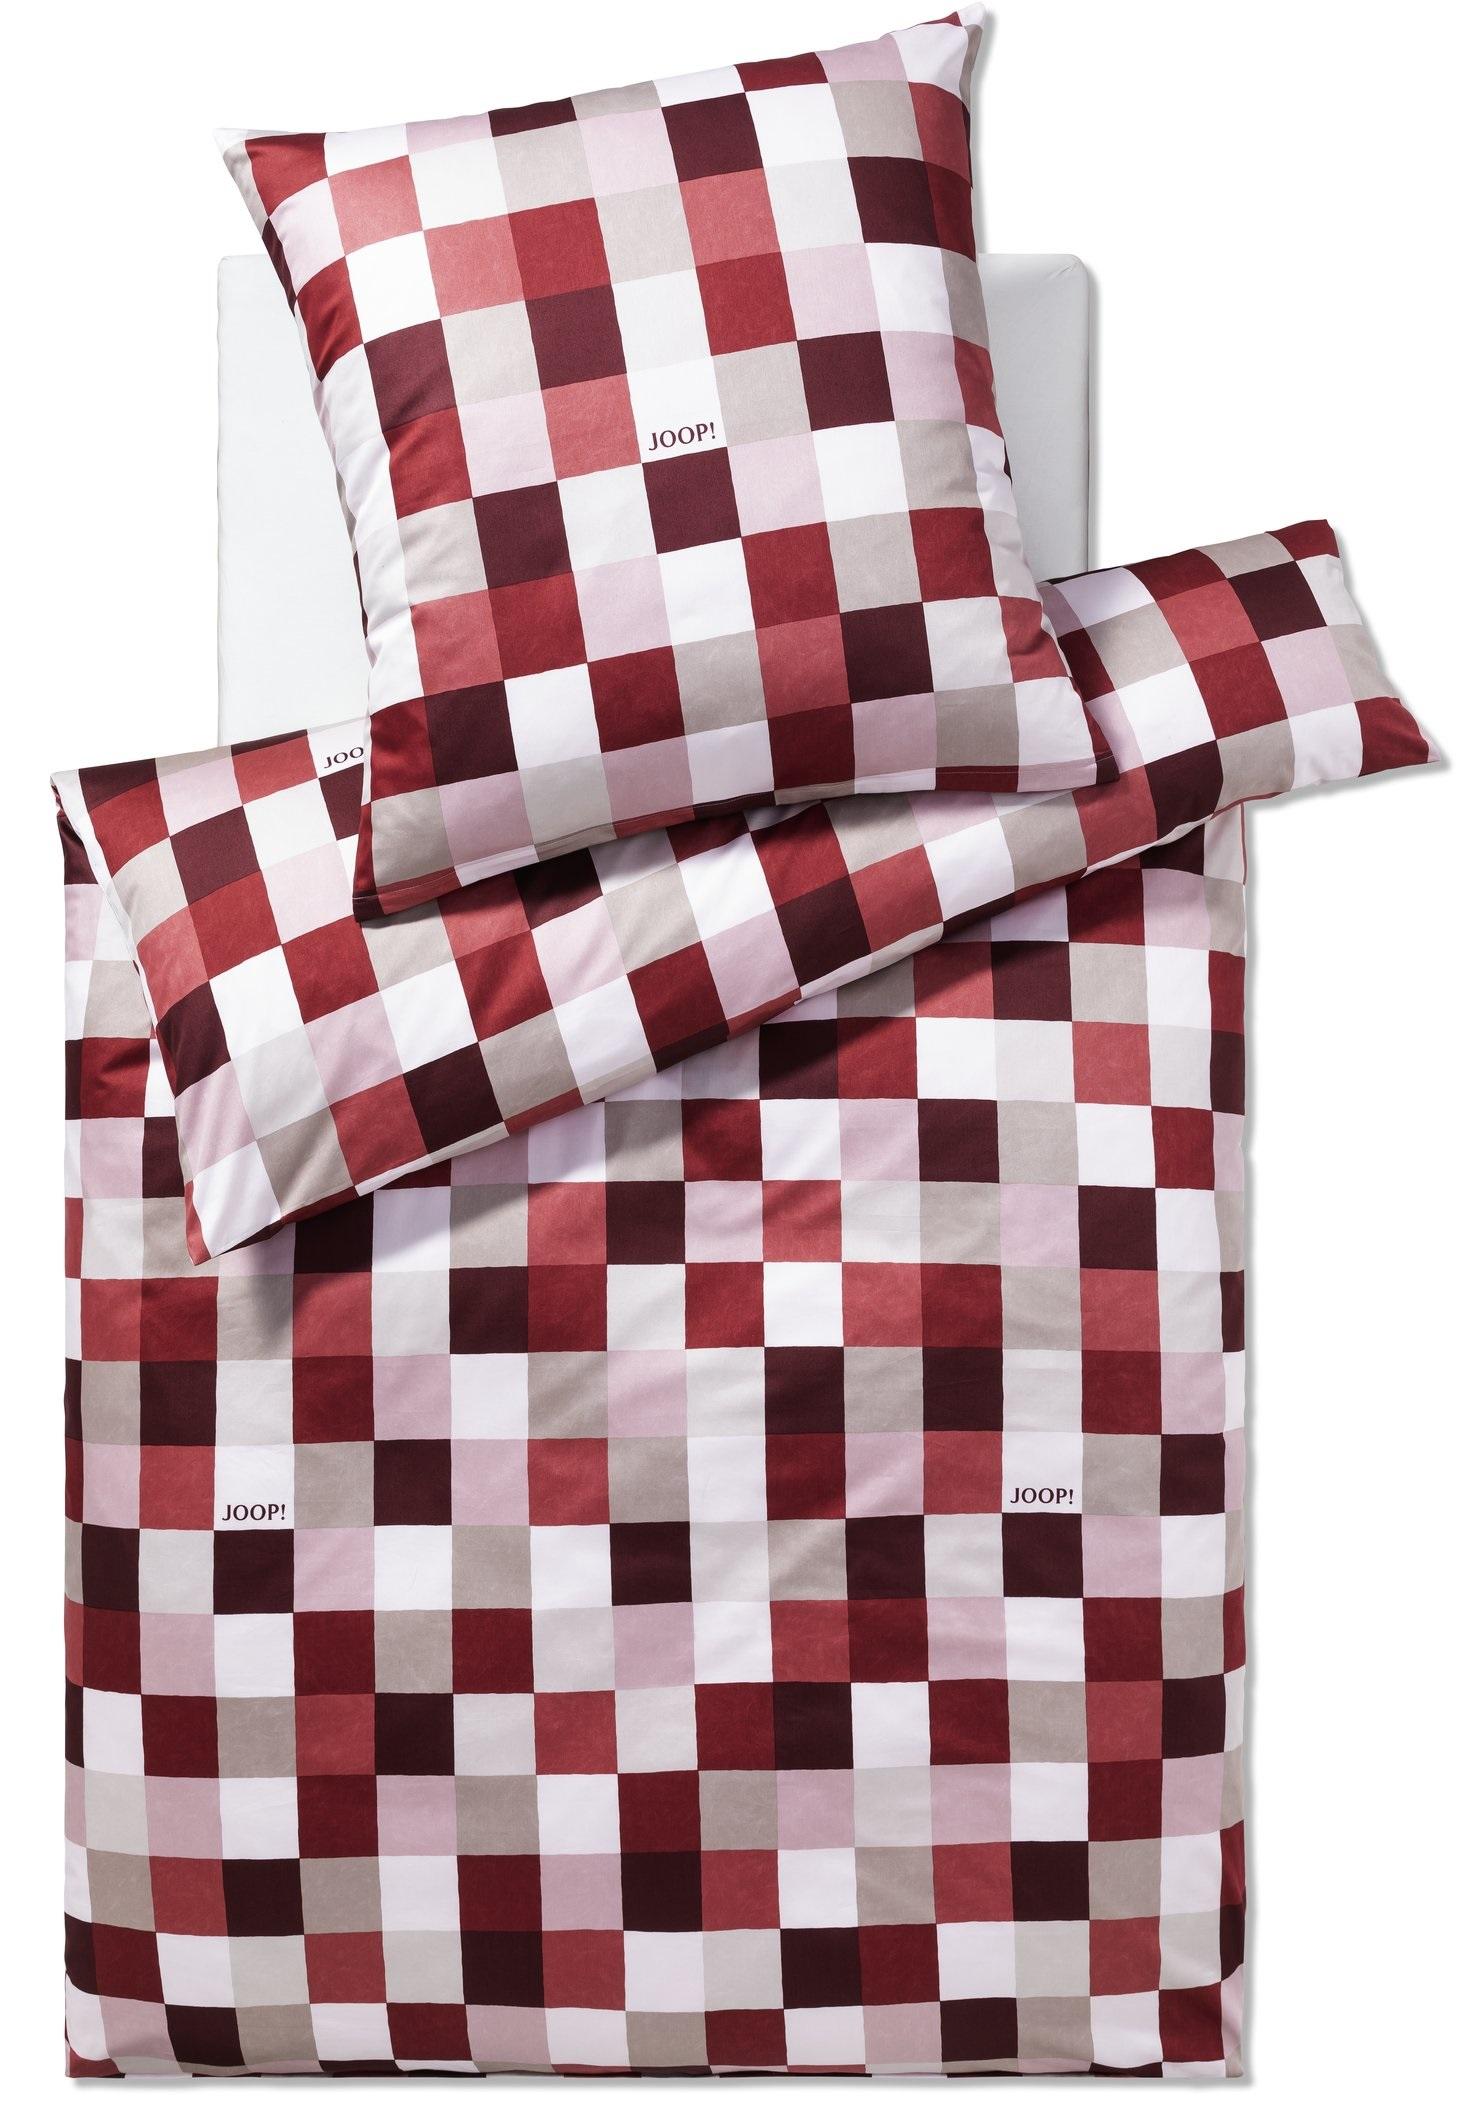 JOOP! Bettwäsche Mosaic 4092-01 Ruby 155x220 cm Kollektion 2020